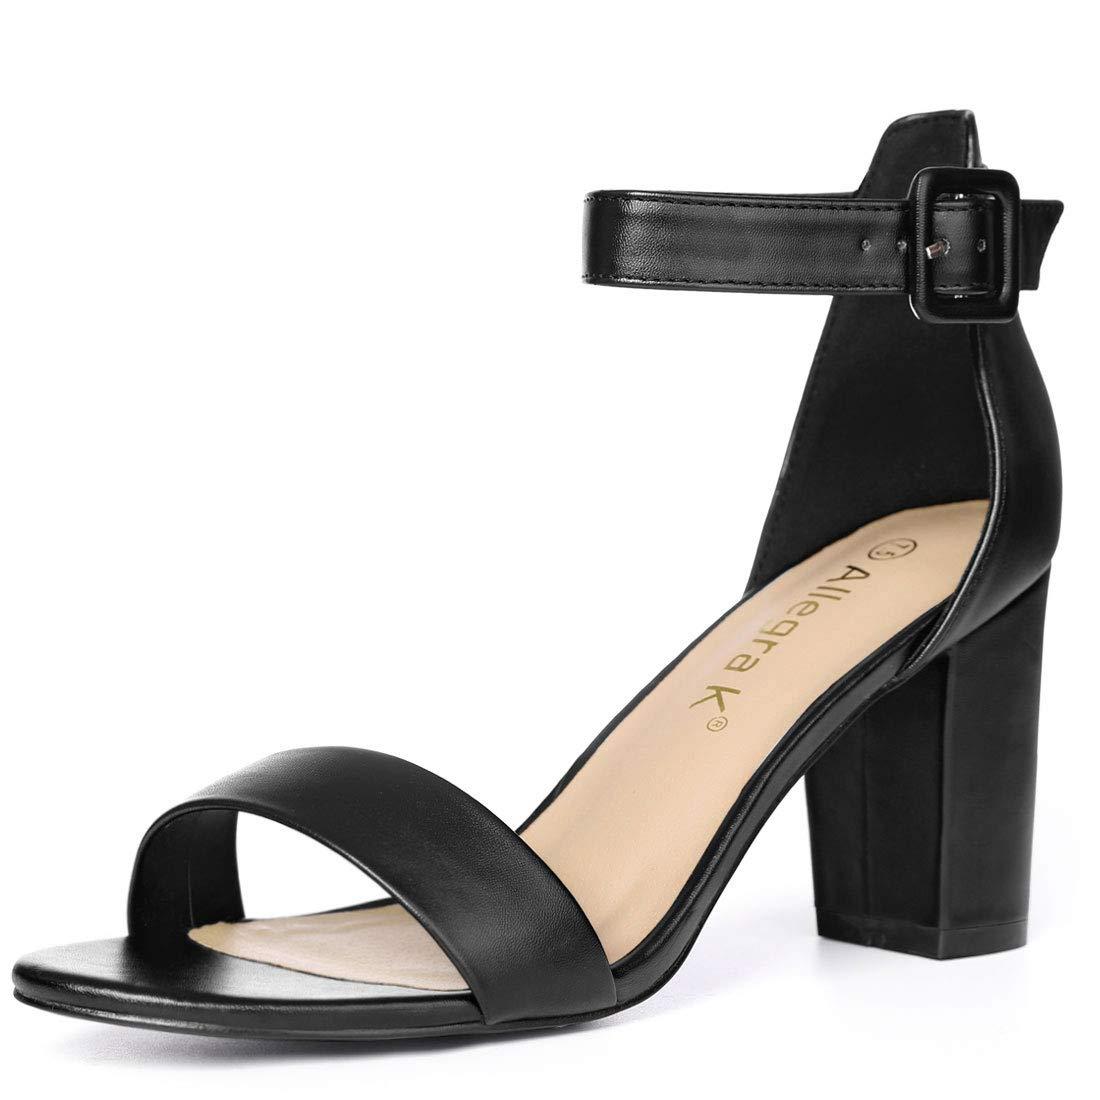 779d7fdbfd591 Allegra K Women's High Chunky Heel Buckle Ankle Strap Sandals